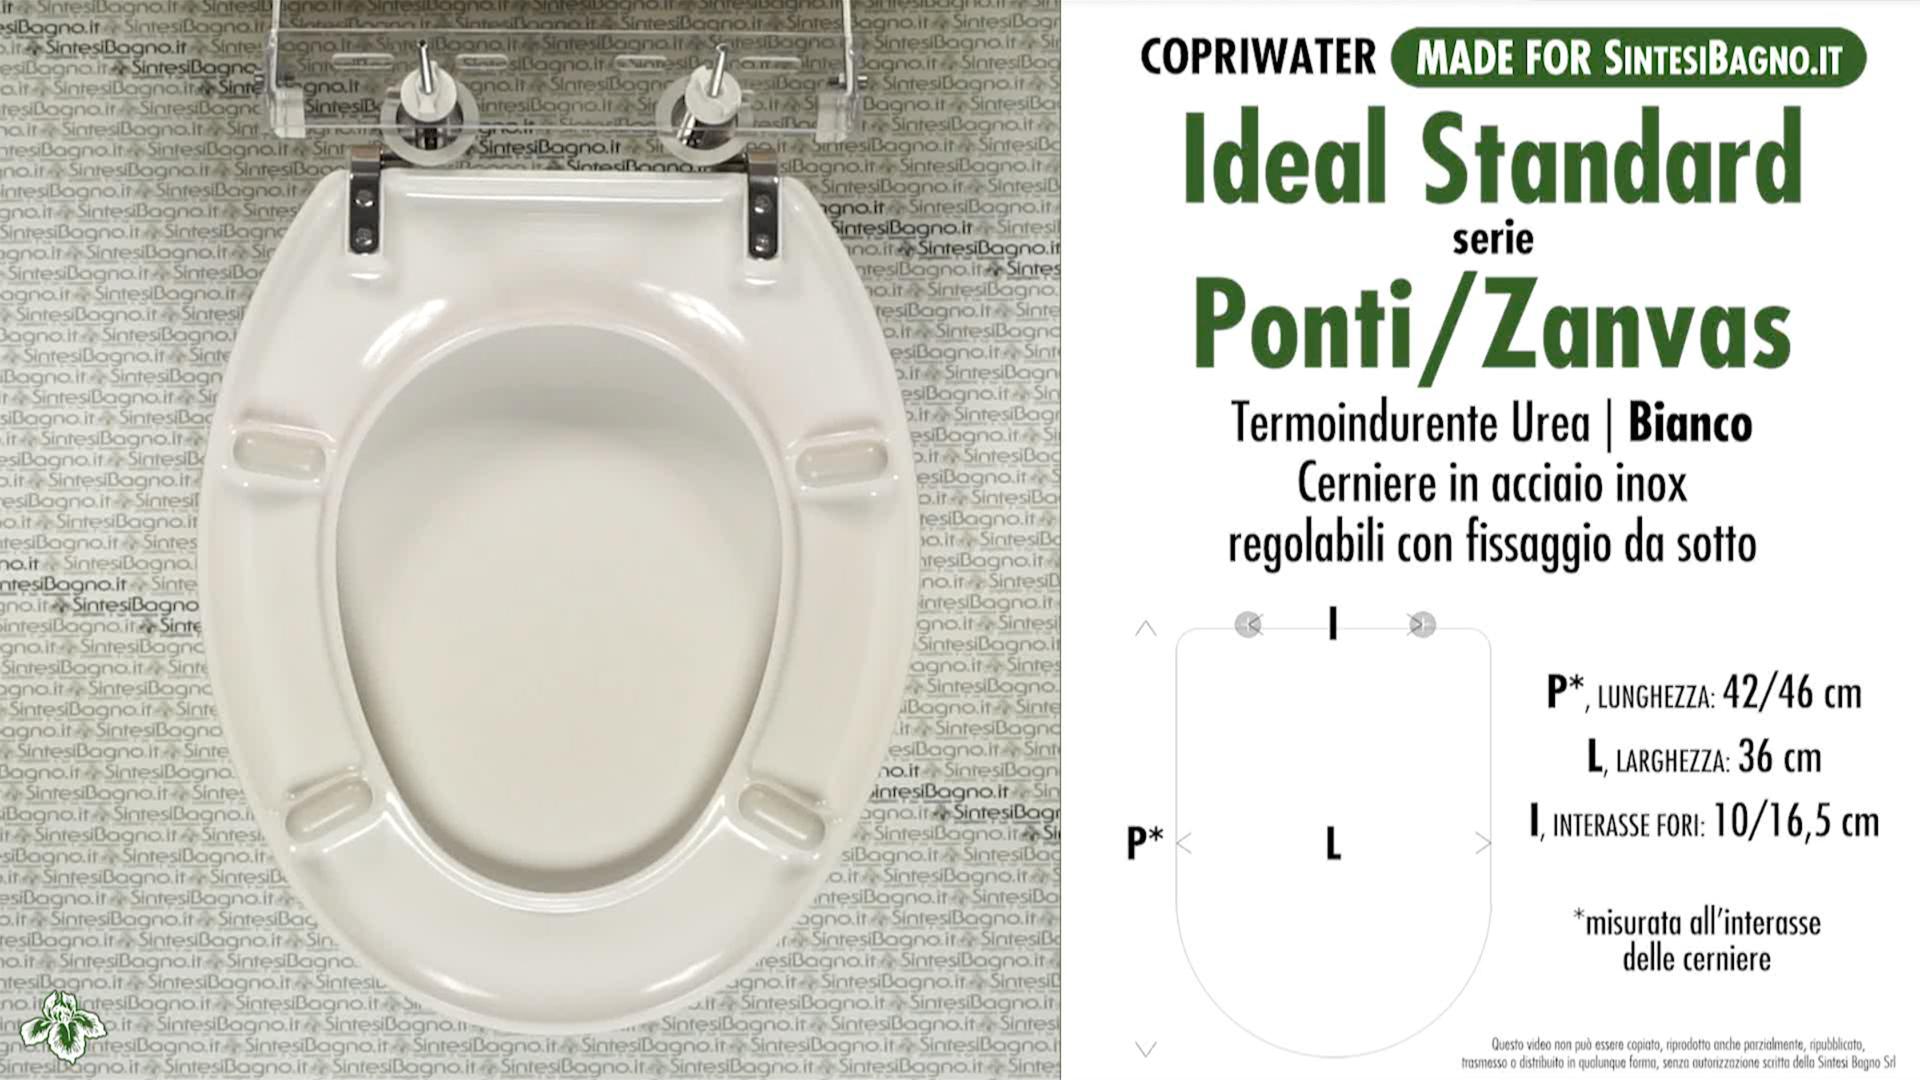 Copriwater Per Vaso Ideal Standard Serie Ponti Zanvas If3157 If3158